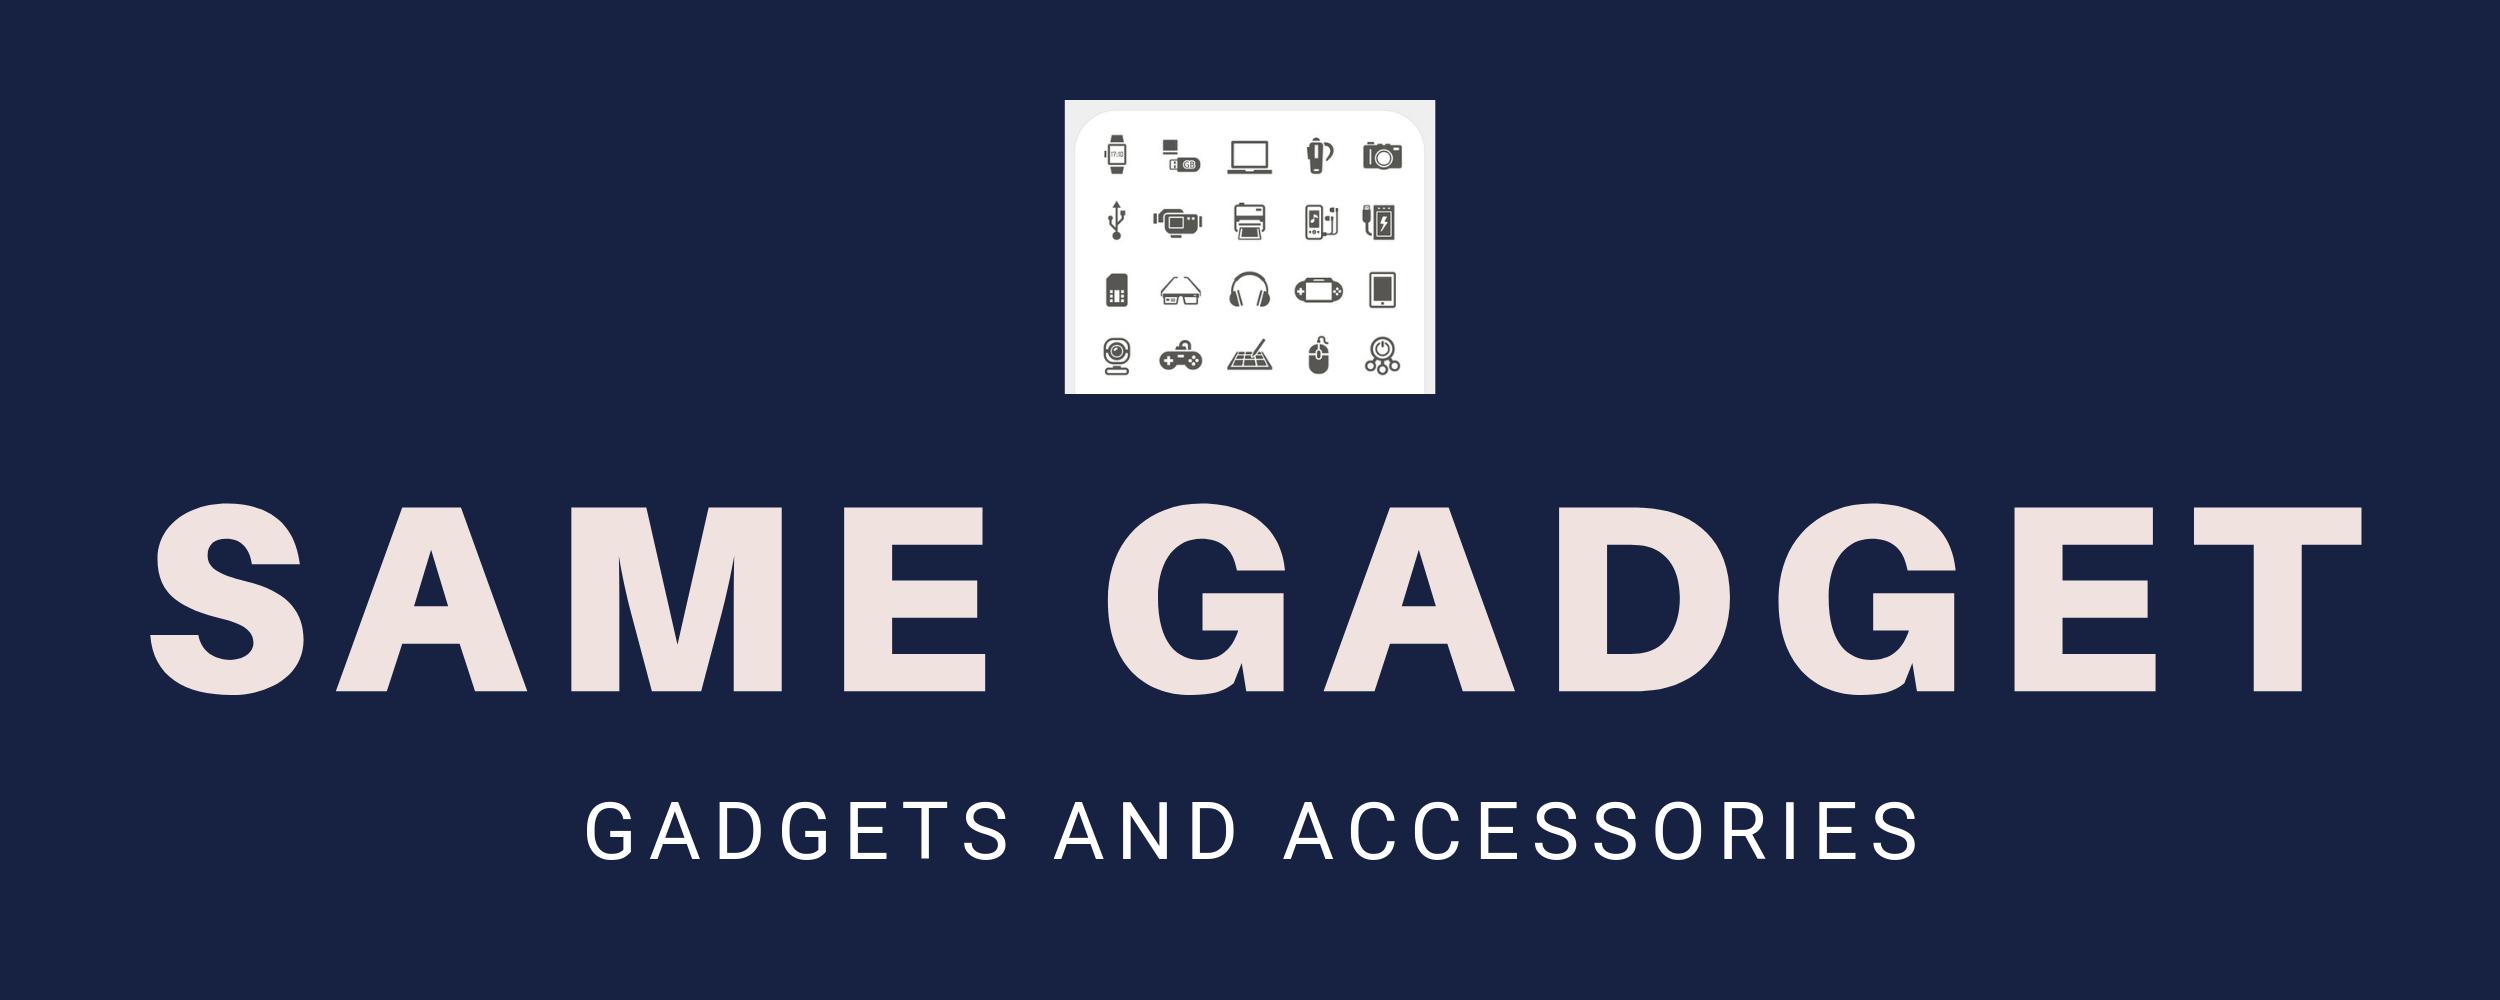 Same Gadget